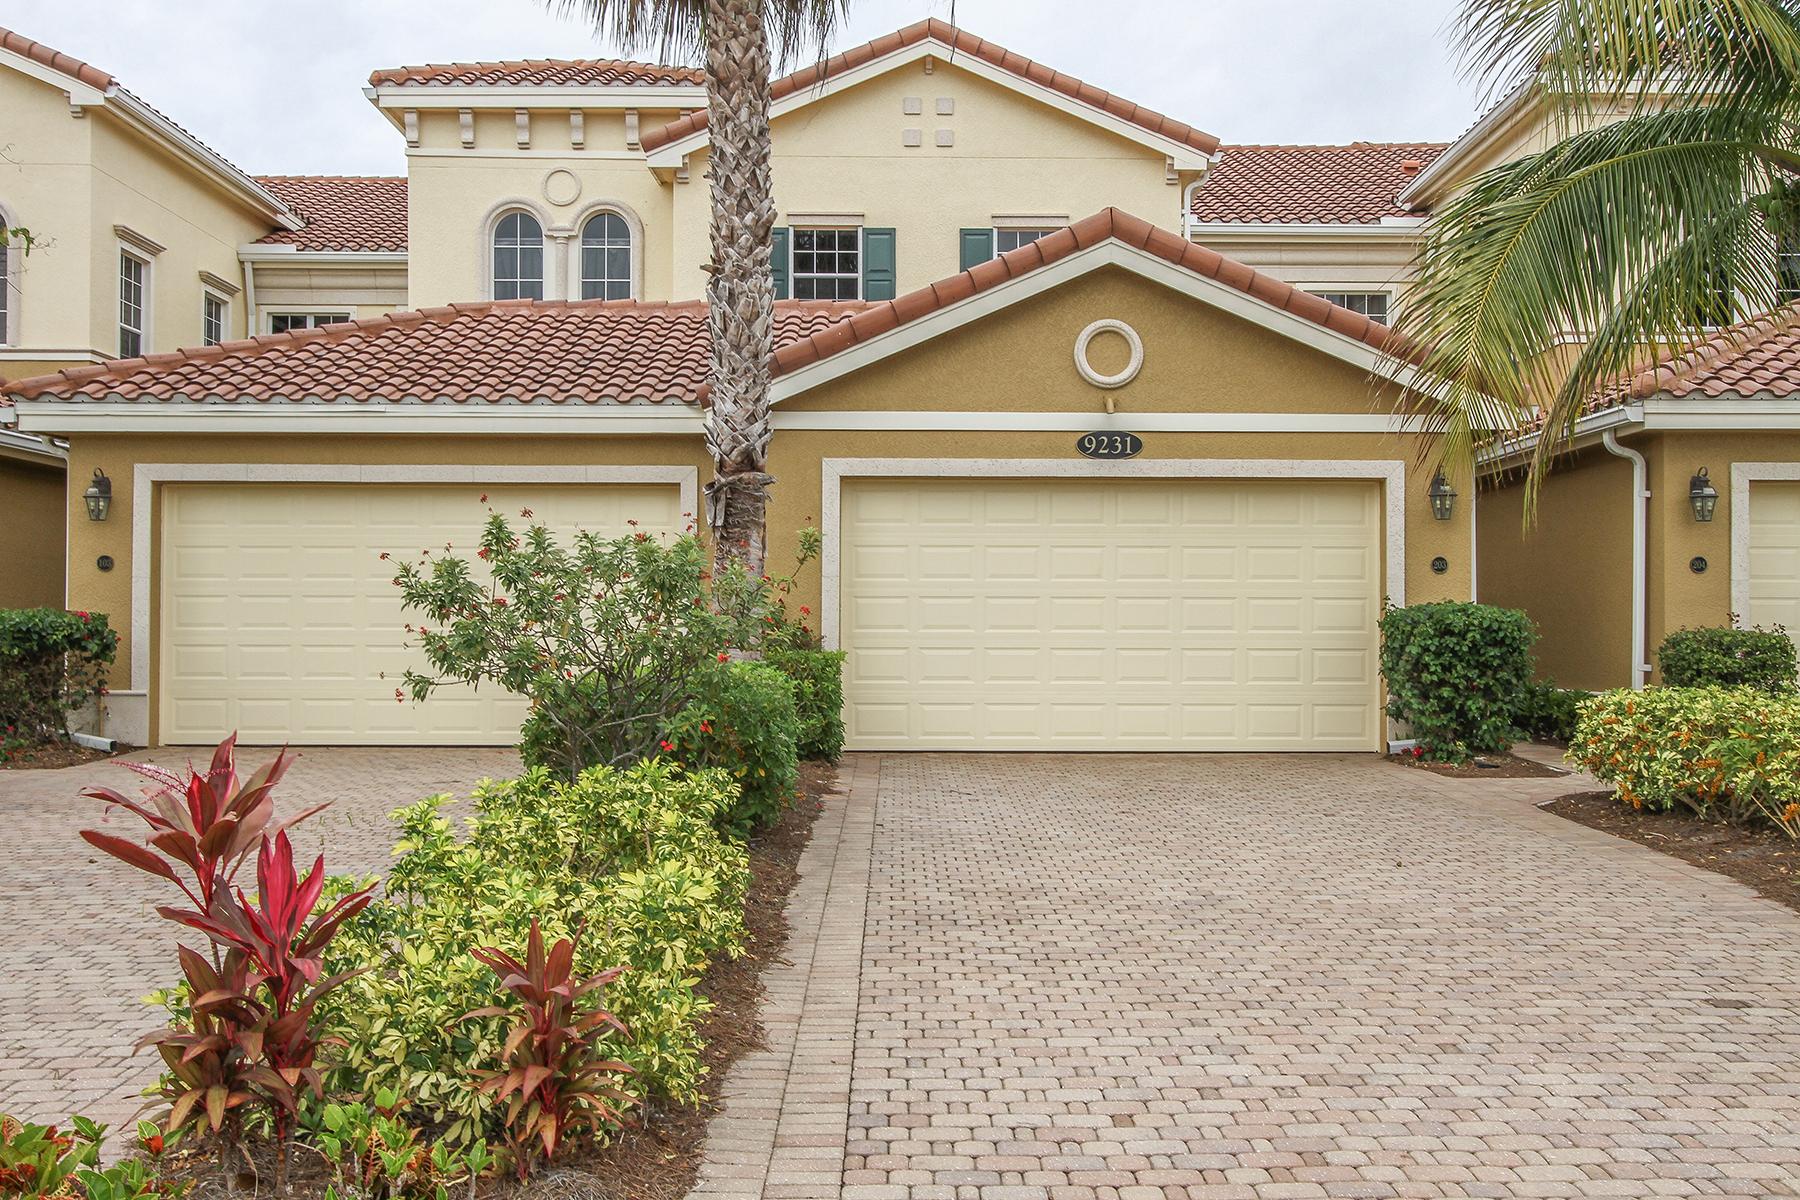 Condo / Townhome / Villa for Rent at 9231 Tesoro Ln 203 Naples, Florida 34114 United States